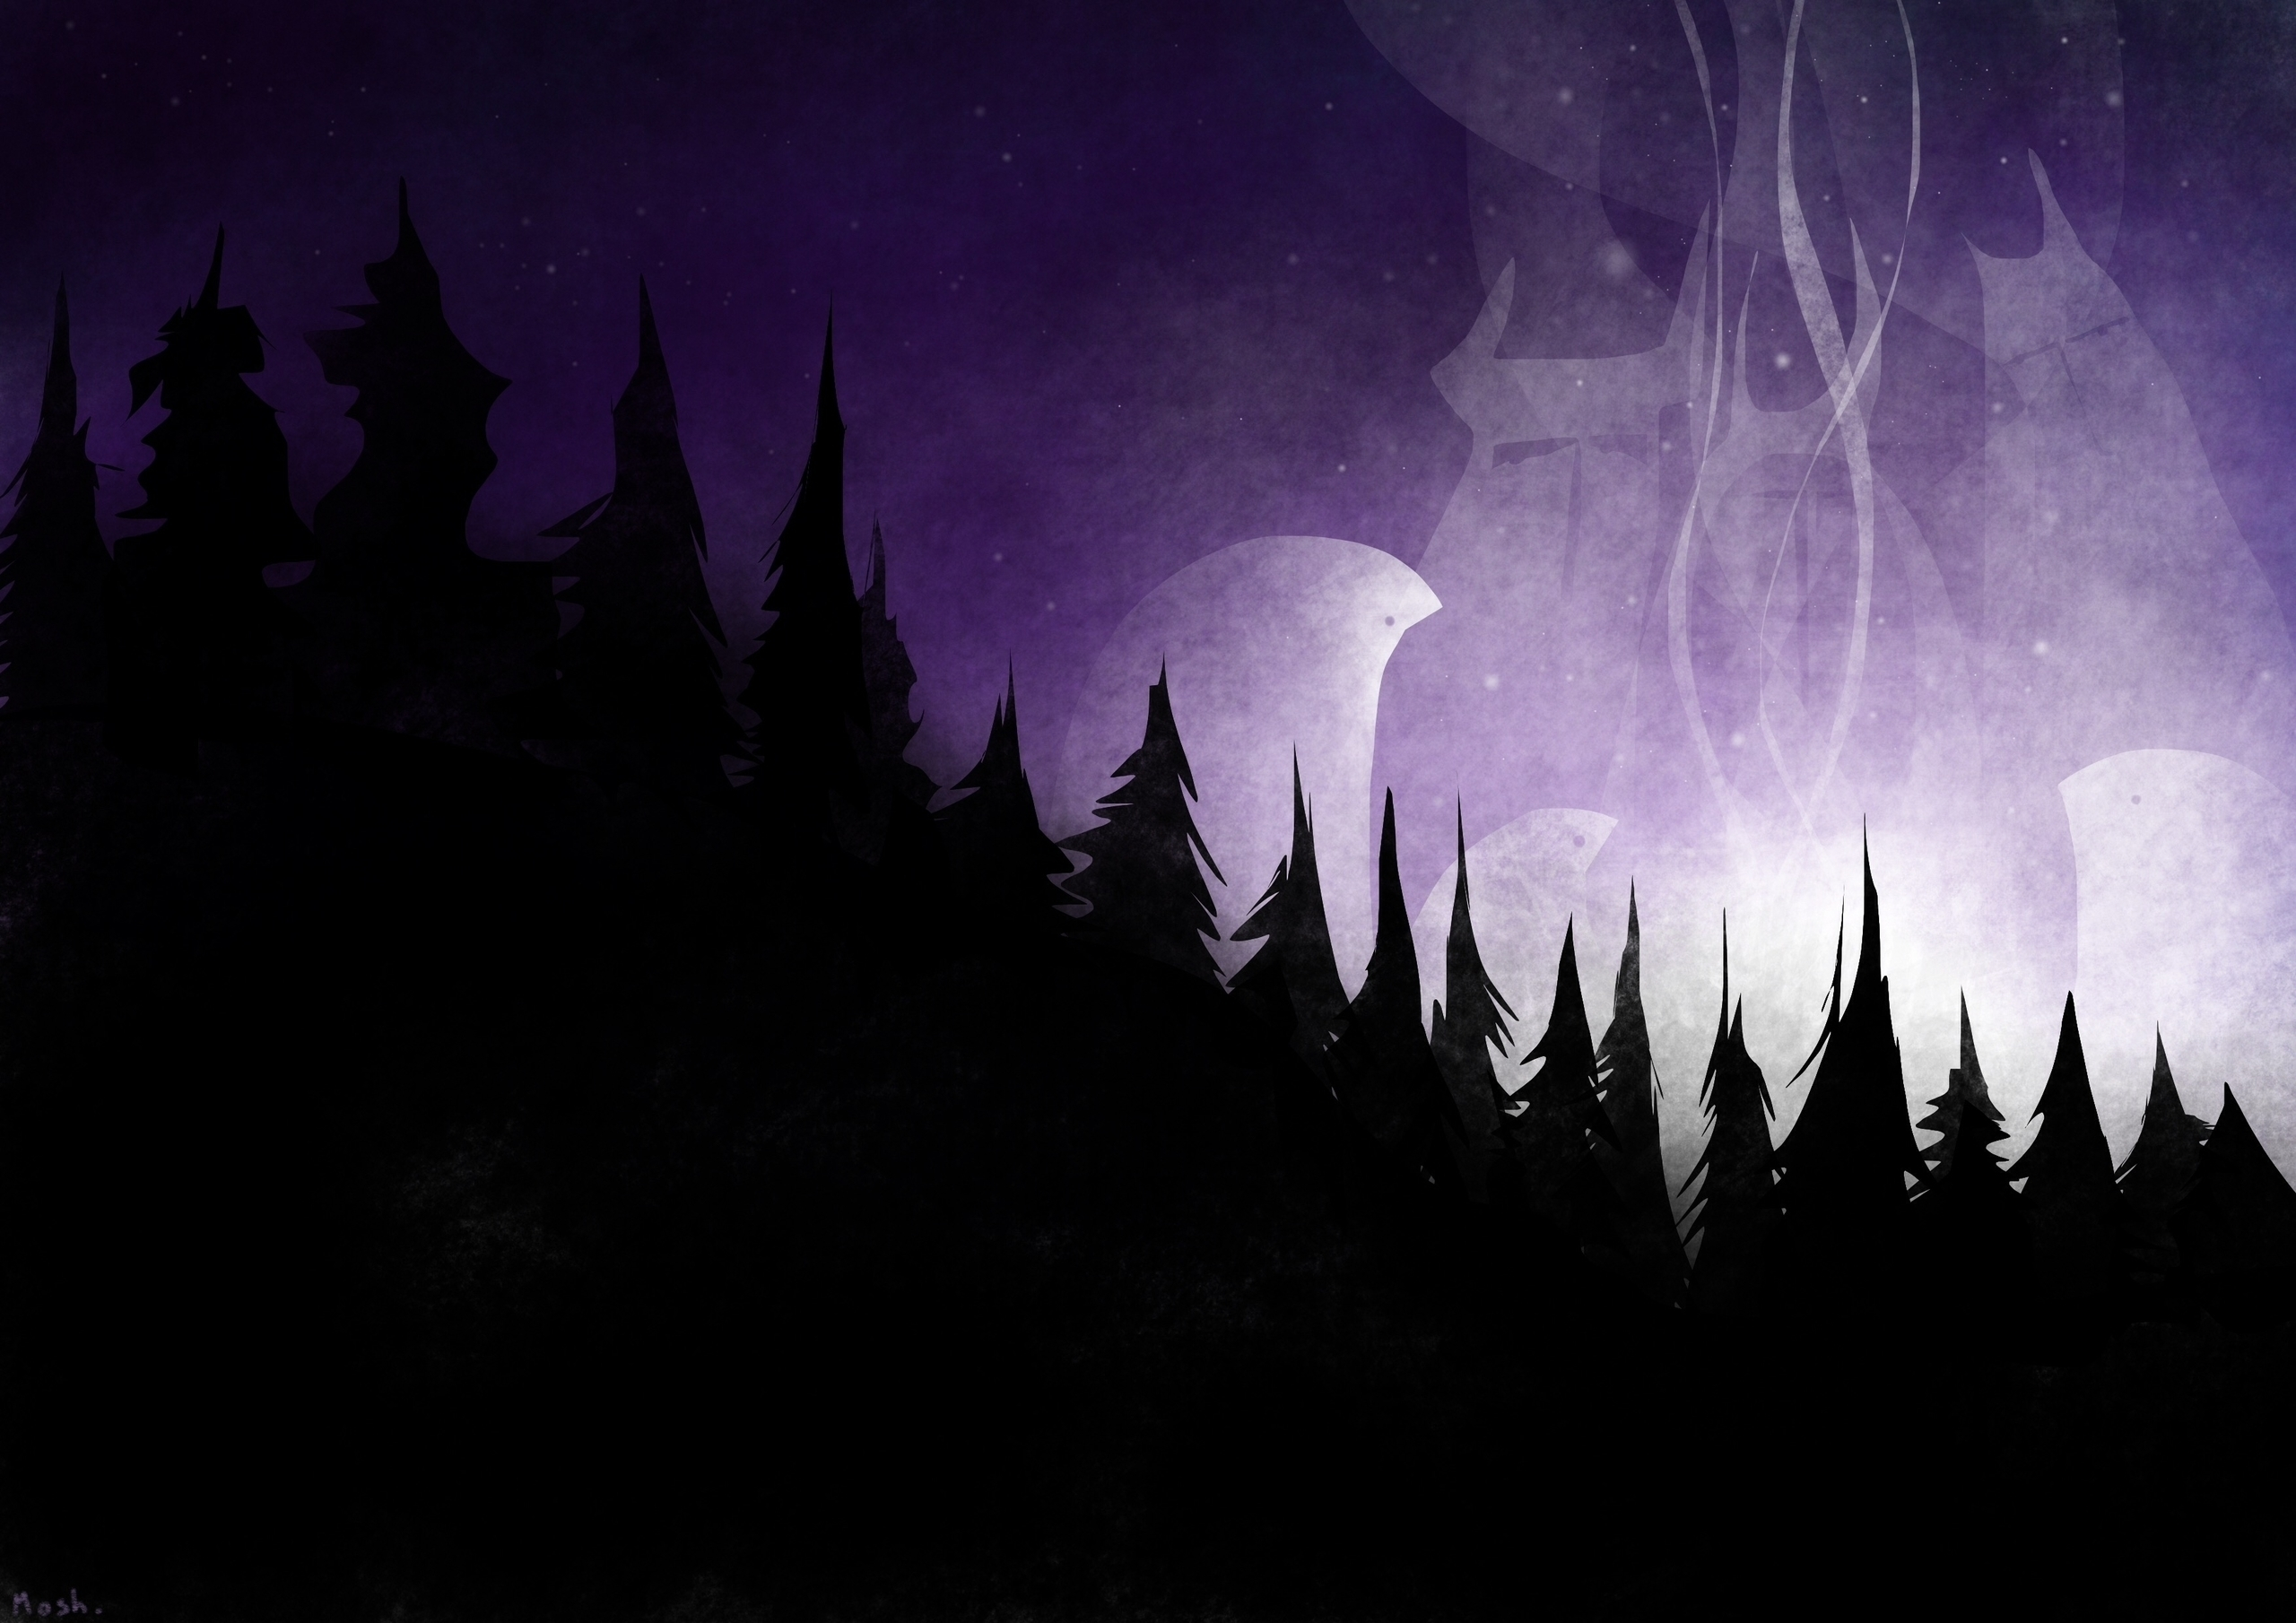 Witching Hour - illustration, characterdesign - mashaghajanyan   ello